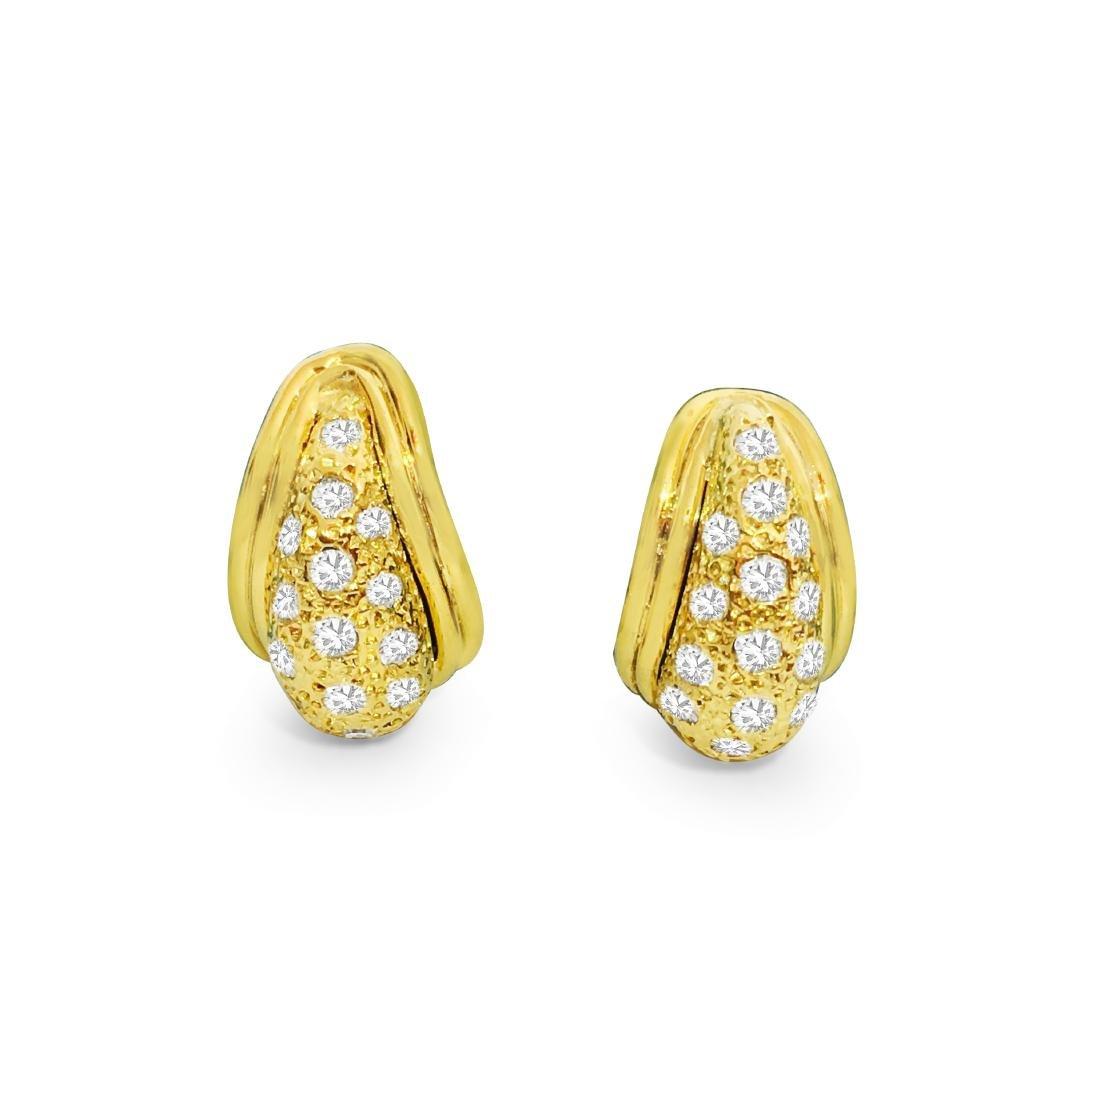 14K Yellow Gold, 1.00 CT Diamond Earrings